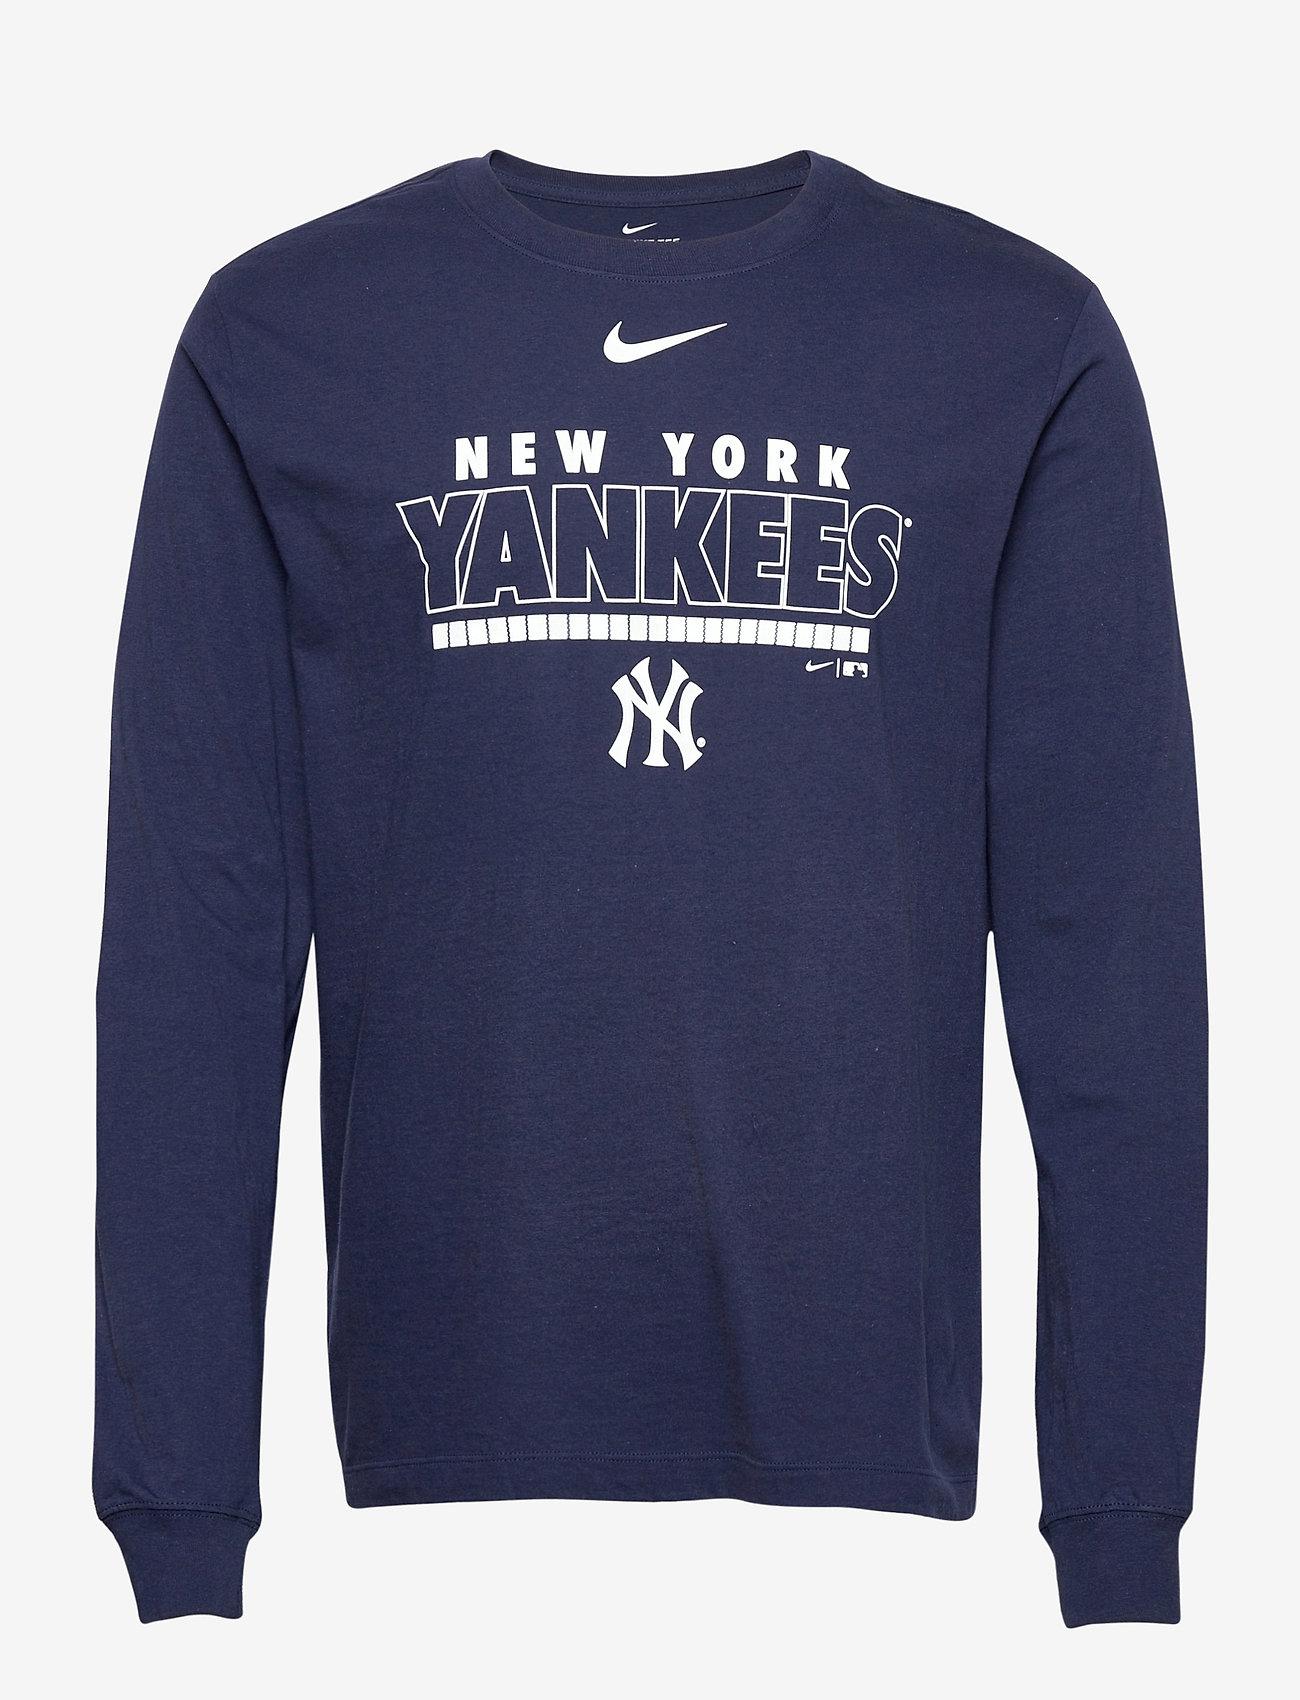 ignorar Negligencia recinto  New York Yankees Nike Color Bar Long Sleeve T-shirt (Midnight Navy) (44.90  €) - NIKE Fan Gear - | Boozt.com